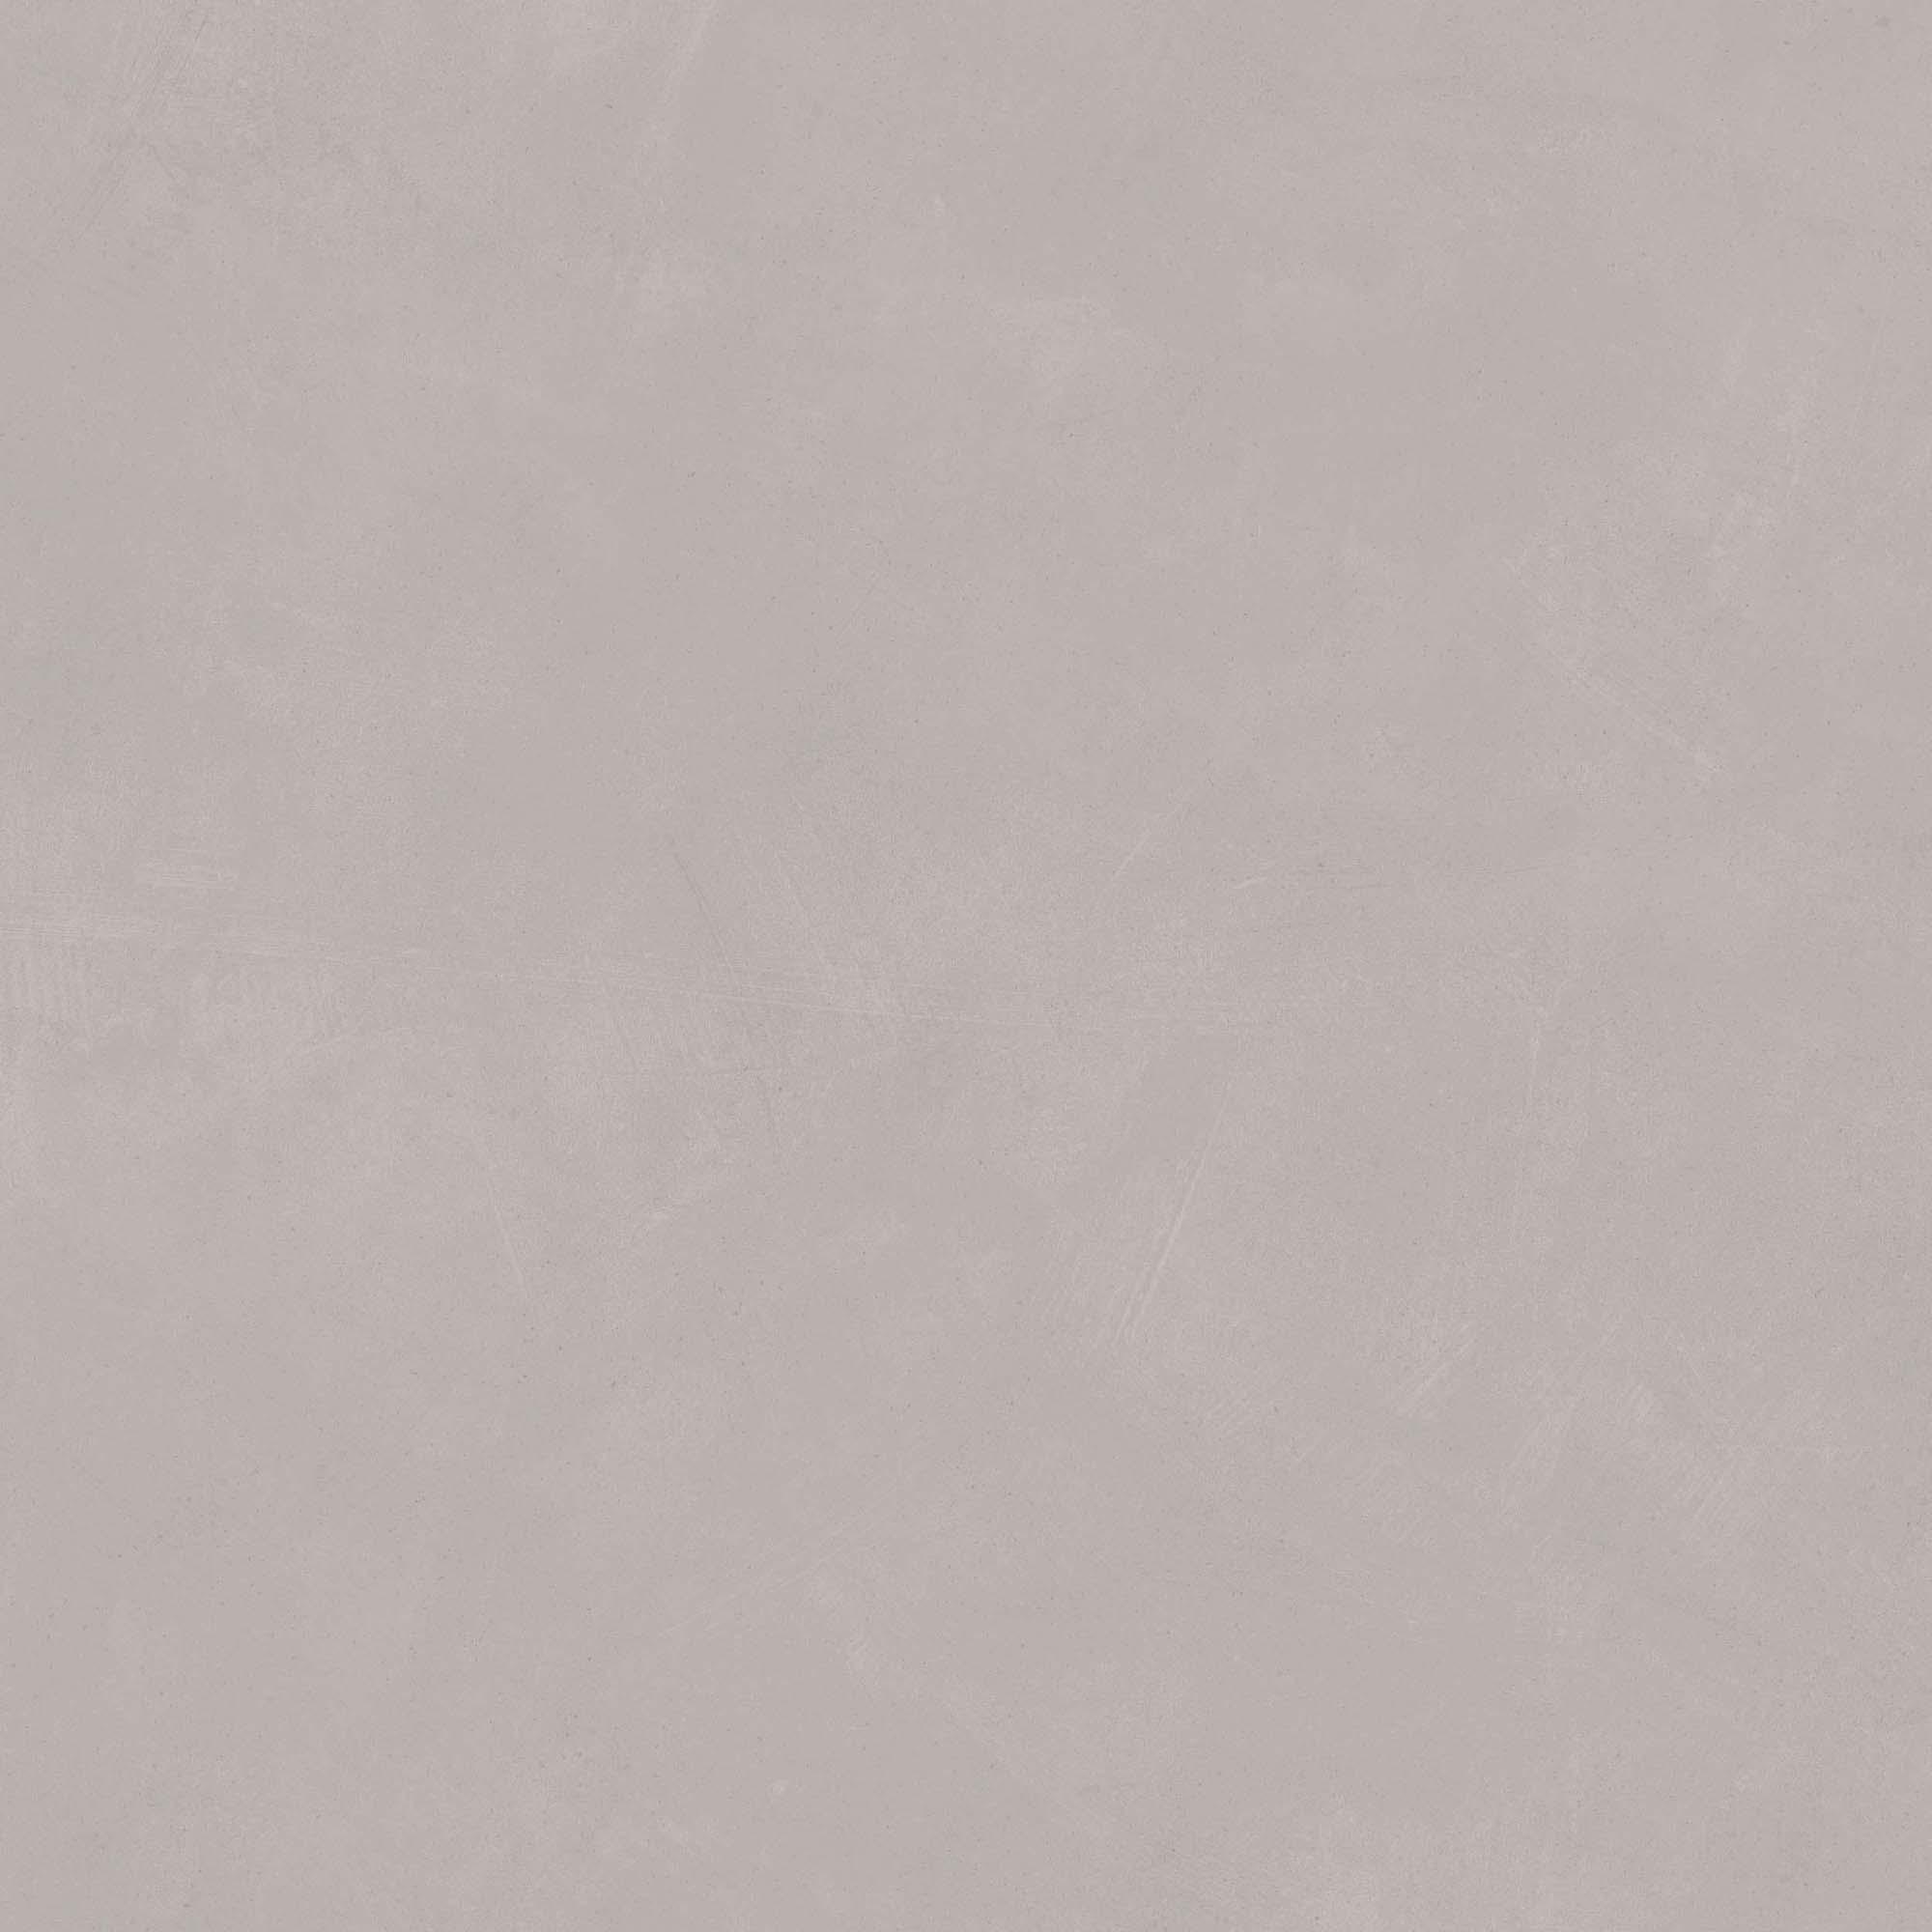 Vloertegels betonlook 90x90 cm - Insideart Grey